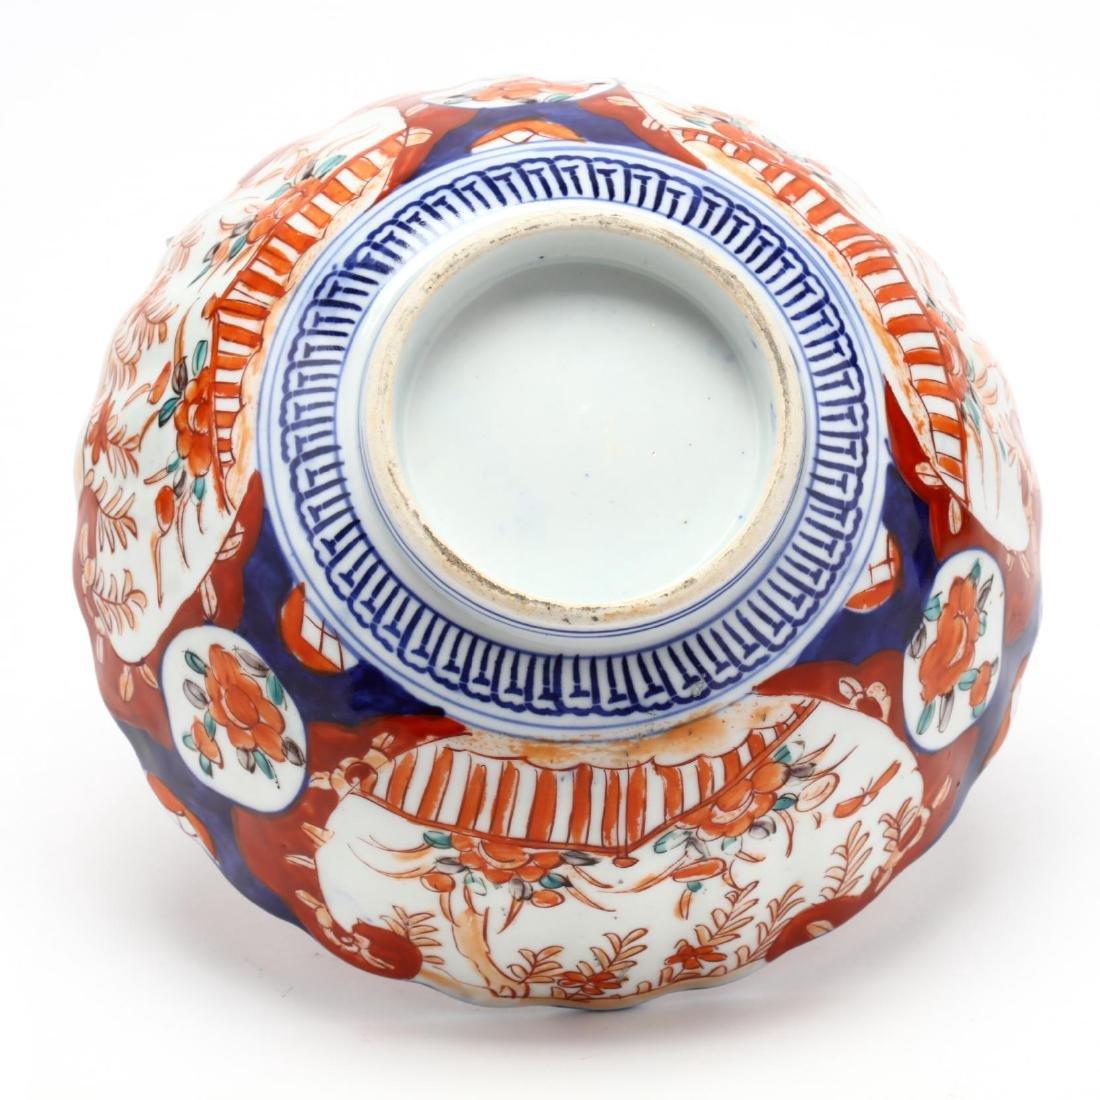 A Group of Imari Porcelain - 8